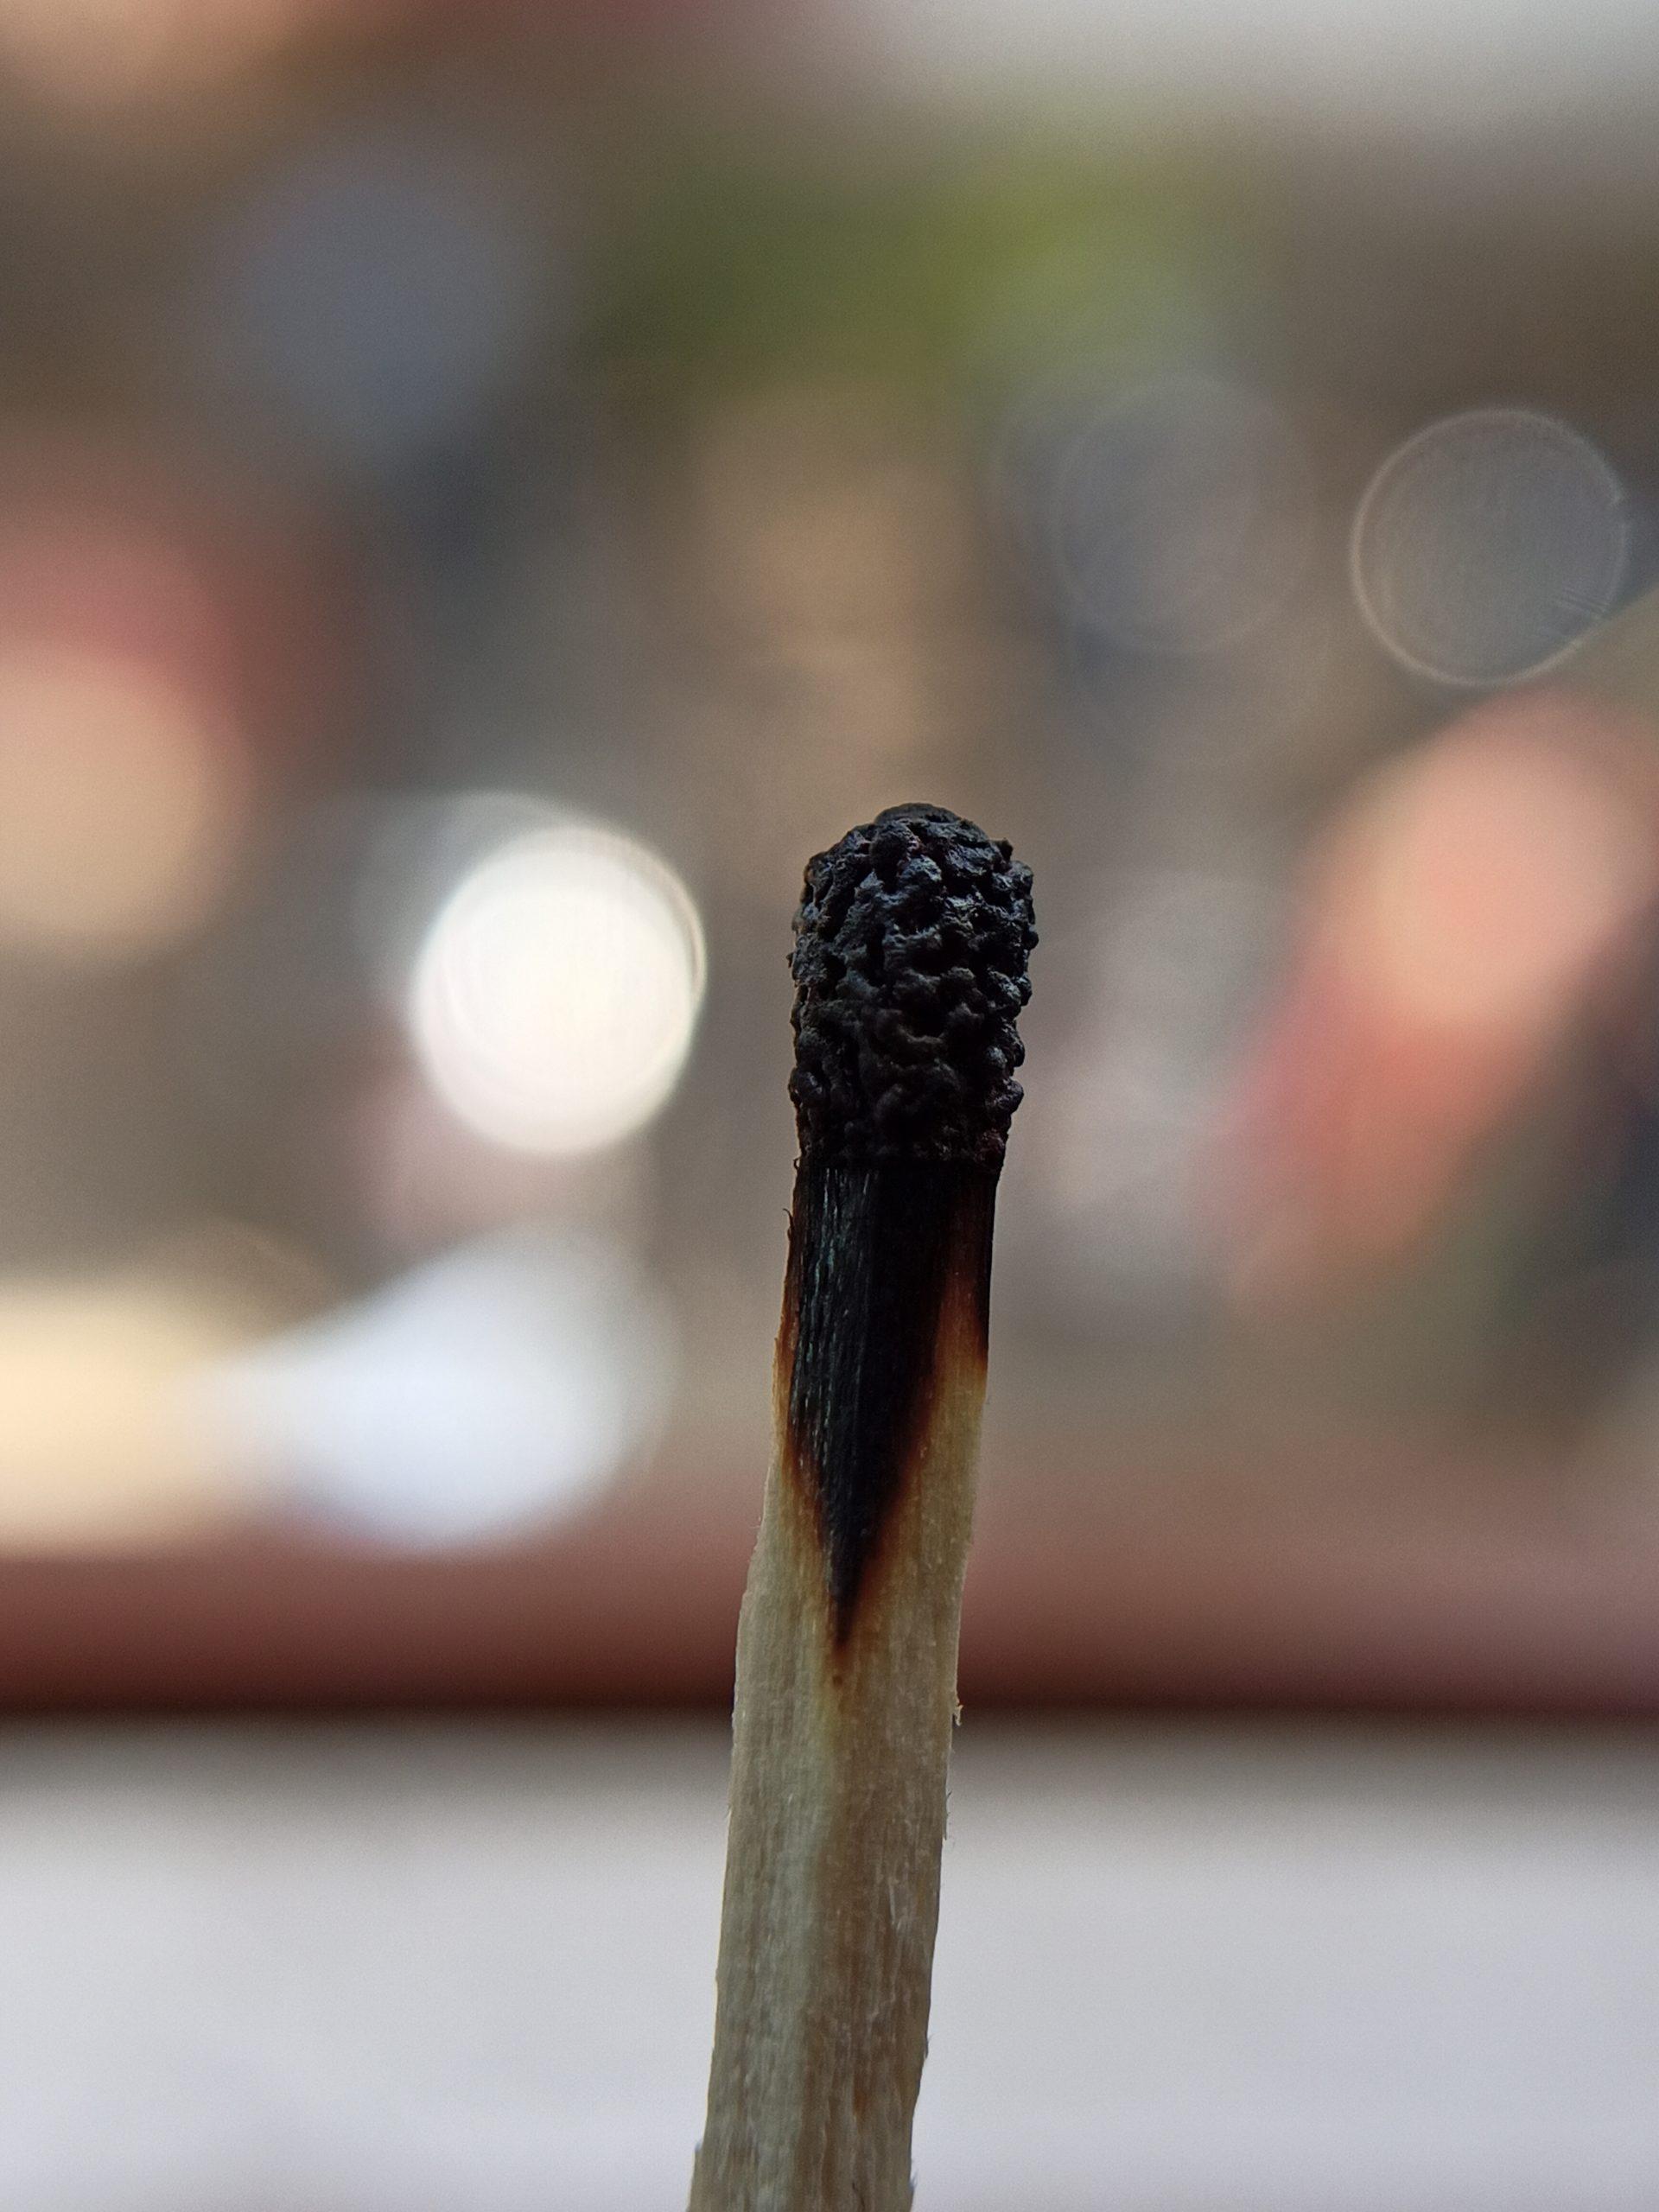 Burned matchstick